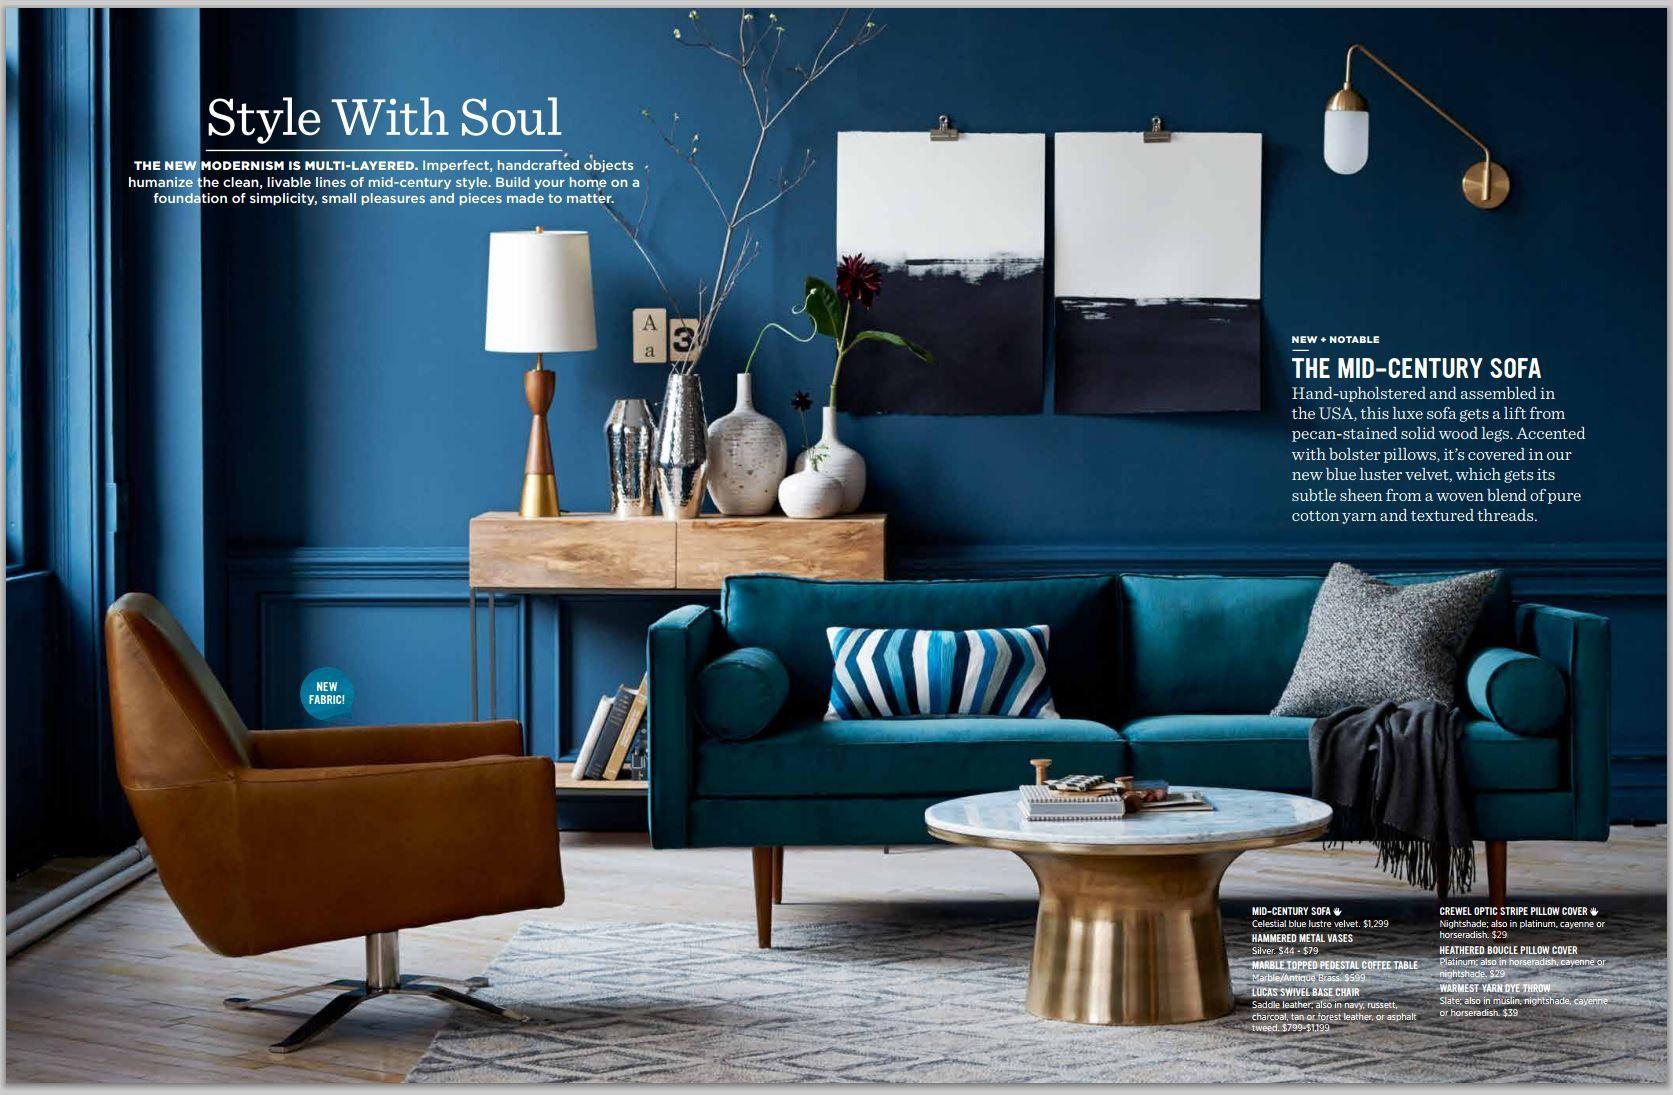 West Elm Teal Blue Brown Tan Gold Bronze And White Living Room Color Schemes Gold Living Room Teal Living Rooms #teal #and #gold #living #room #ideas